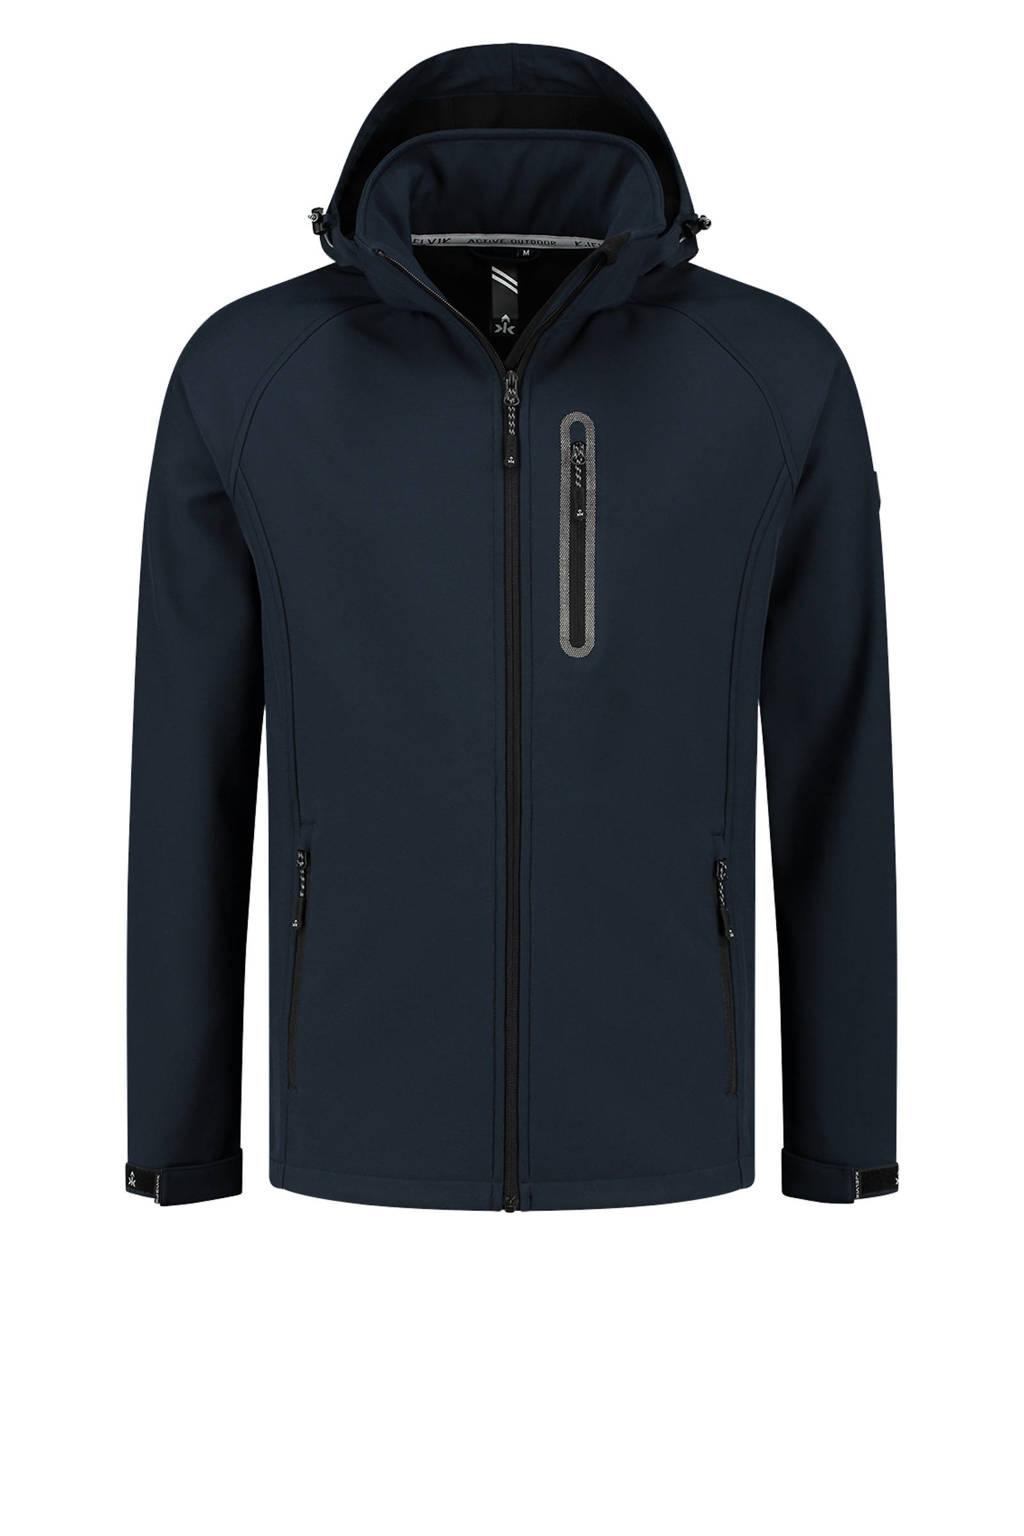 Kjelvik outdoor jas Kevan donkerblauw, Donkerblauw